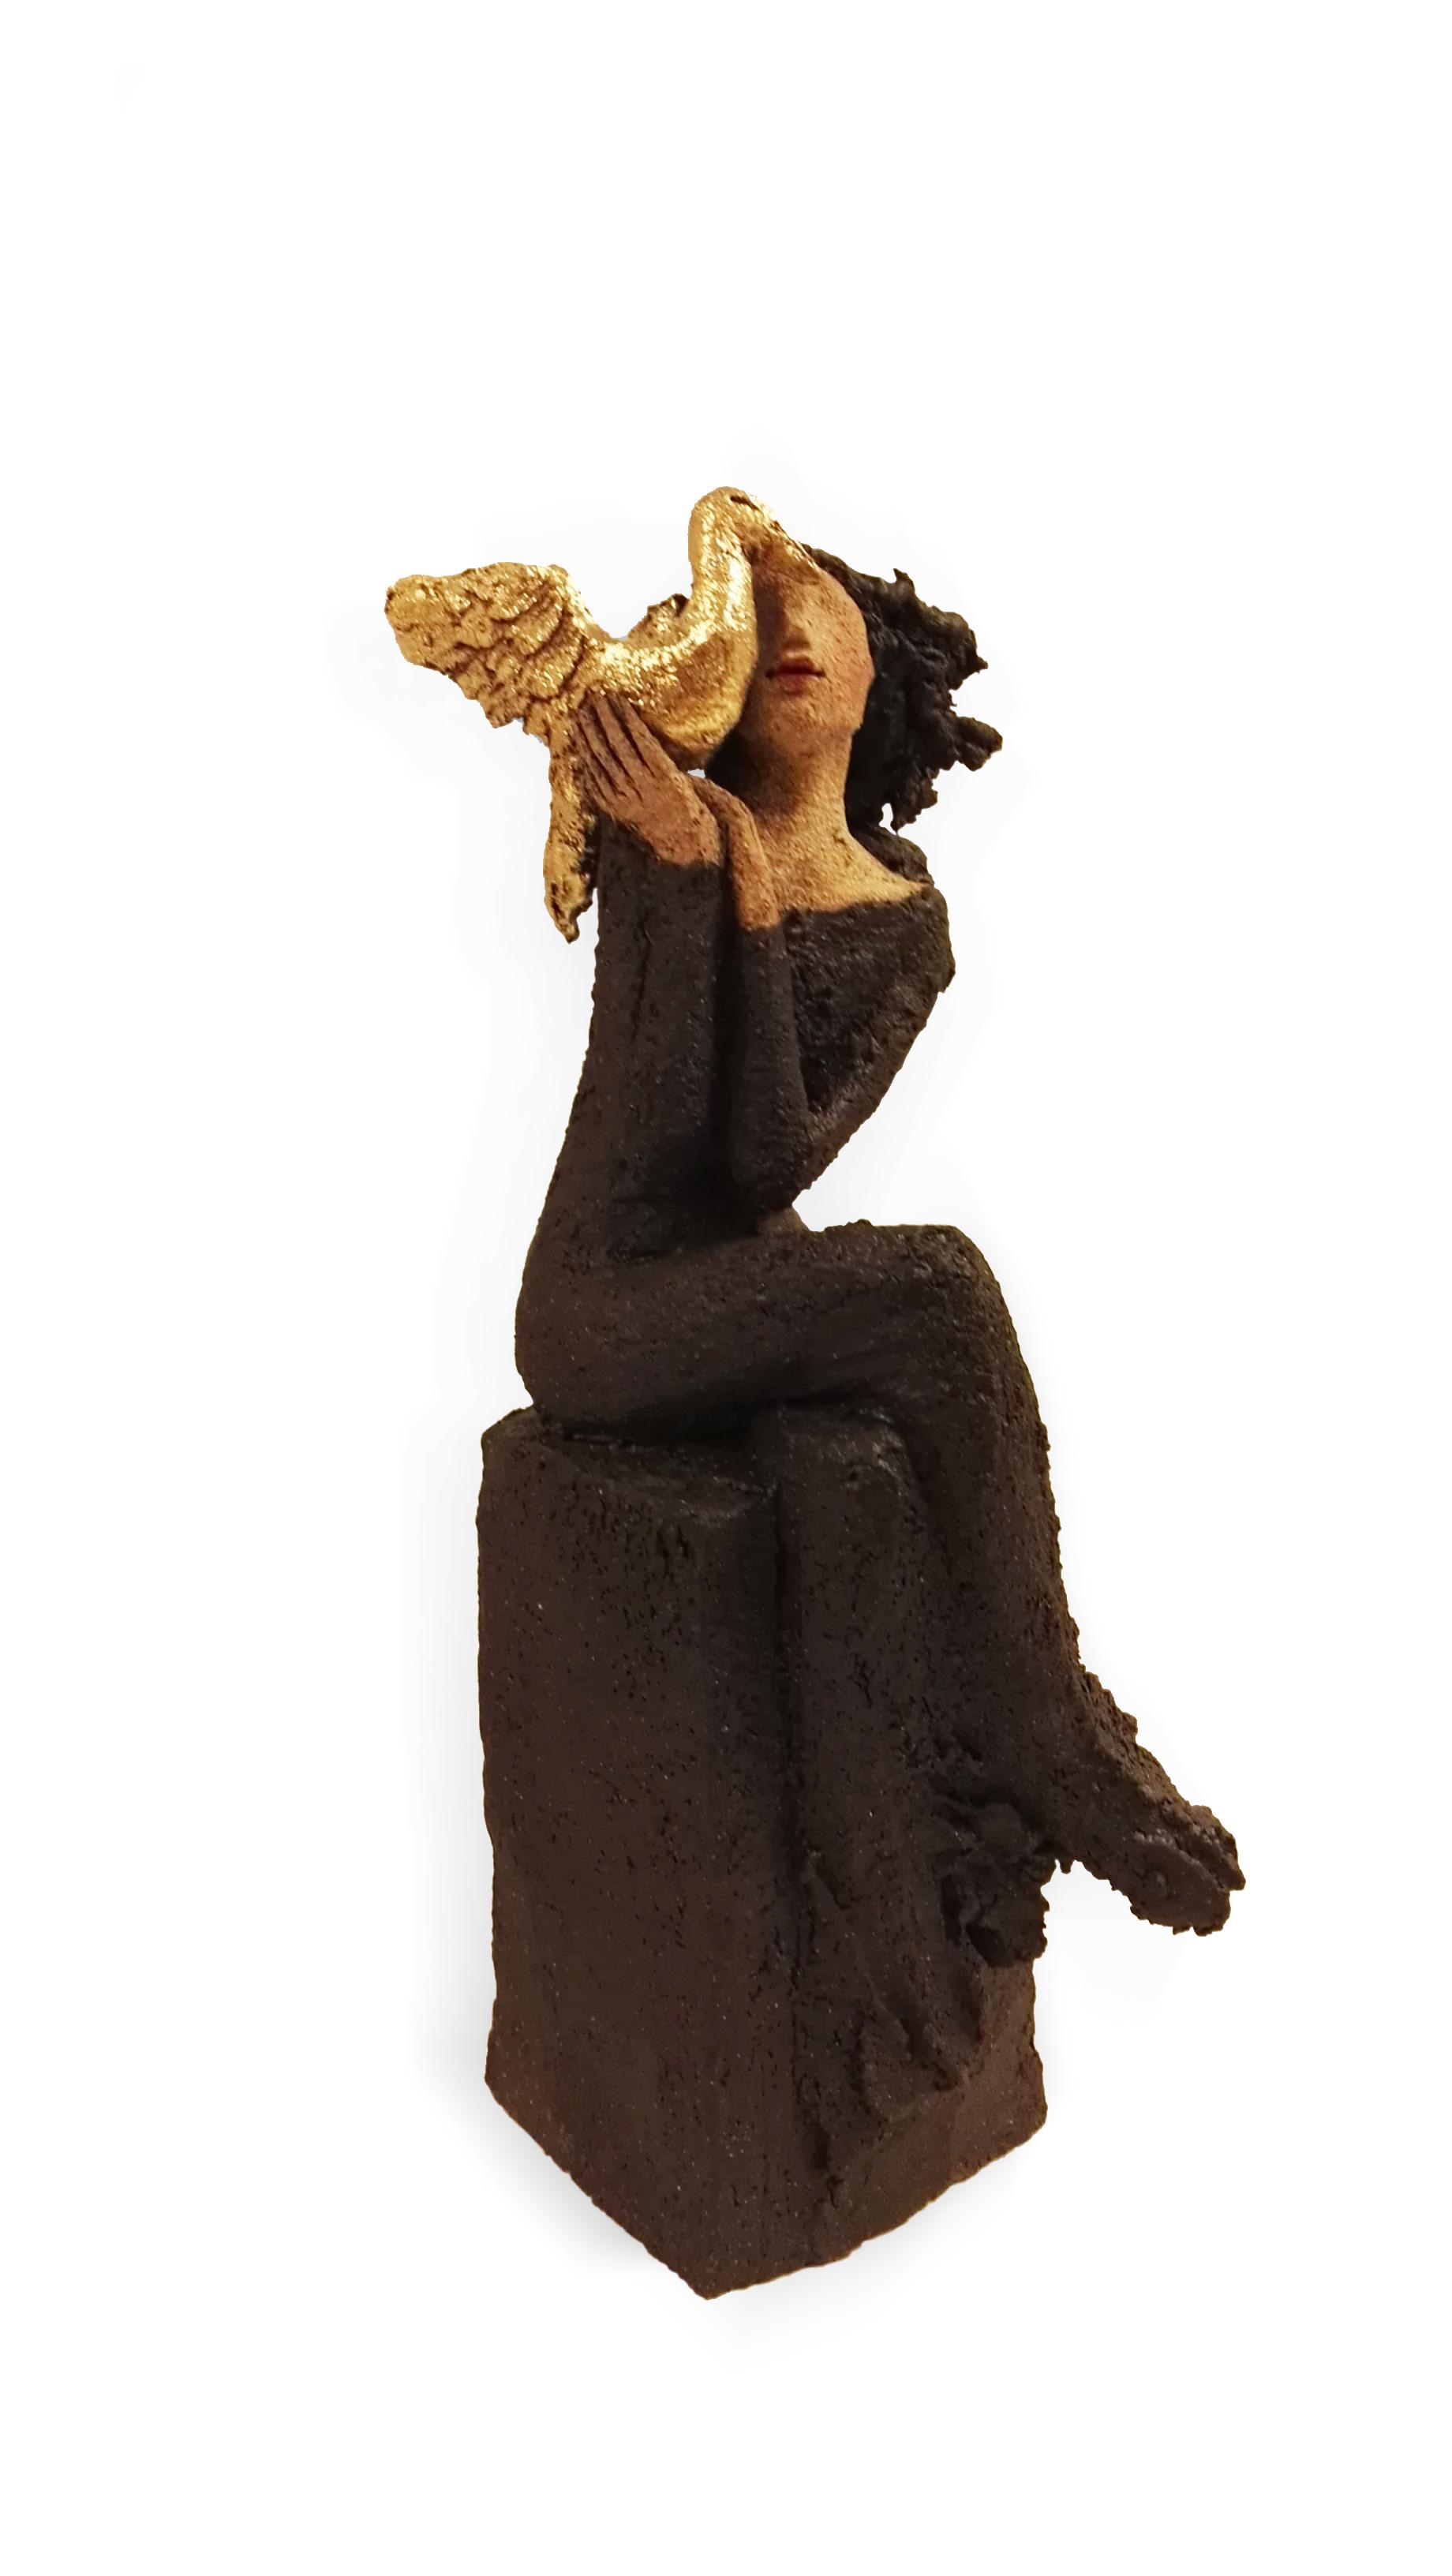 Gullegget, gullfuglen, keramikk, skulptur, Ingun Dahlin